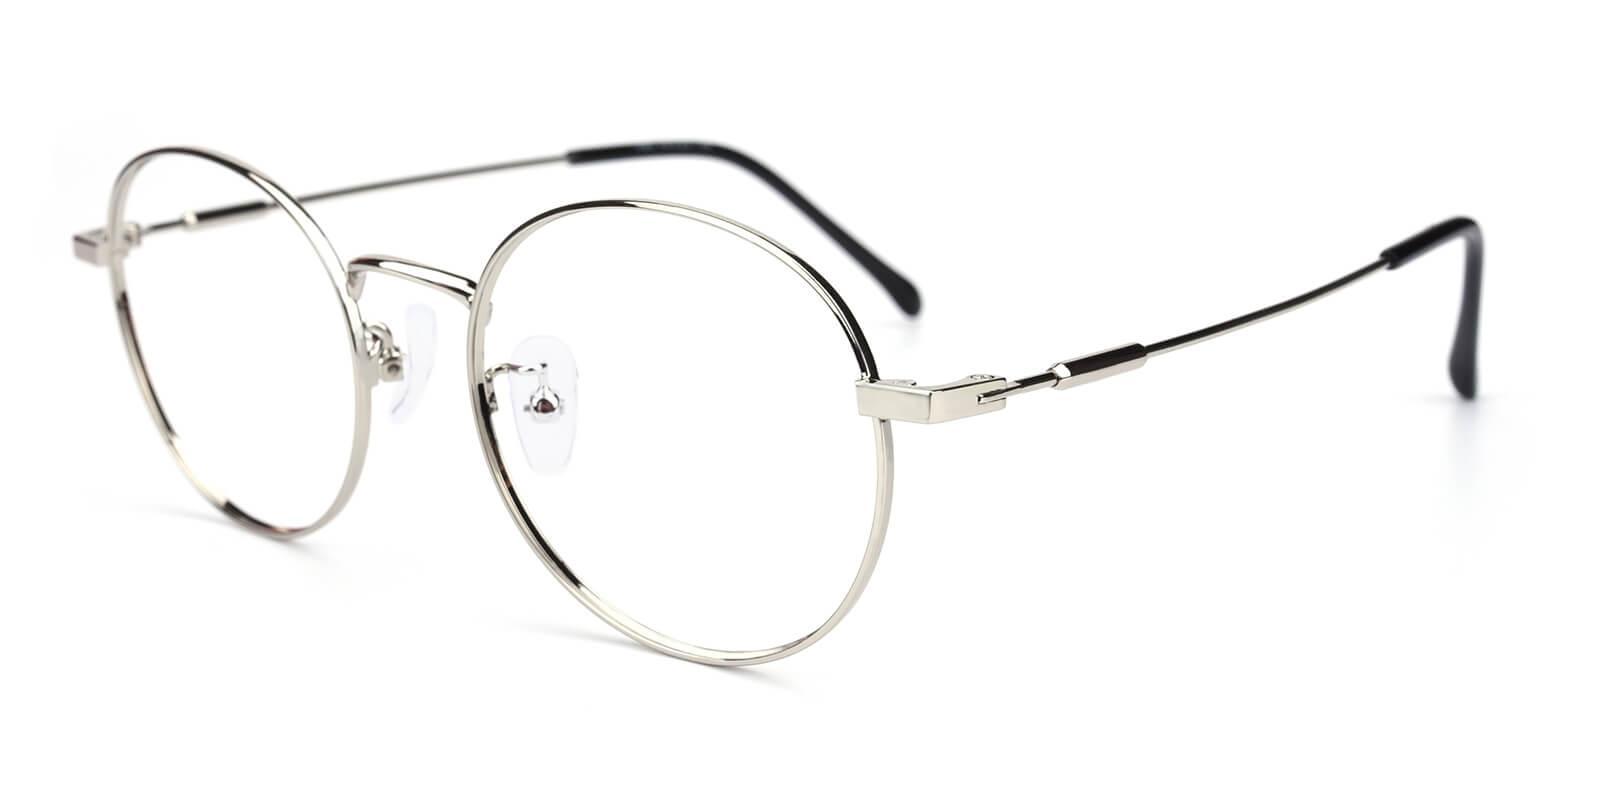 Hibbardr-Silver-Round-Metal-Eyeglasses-additional1